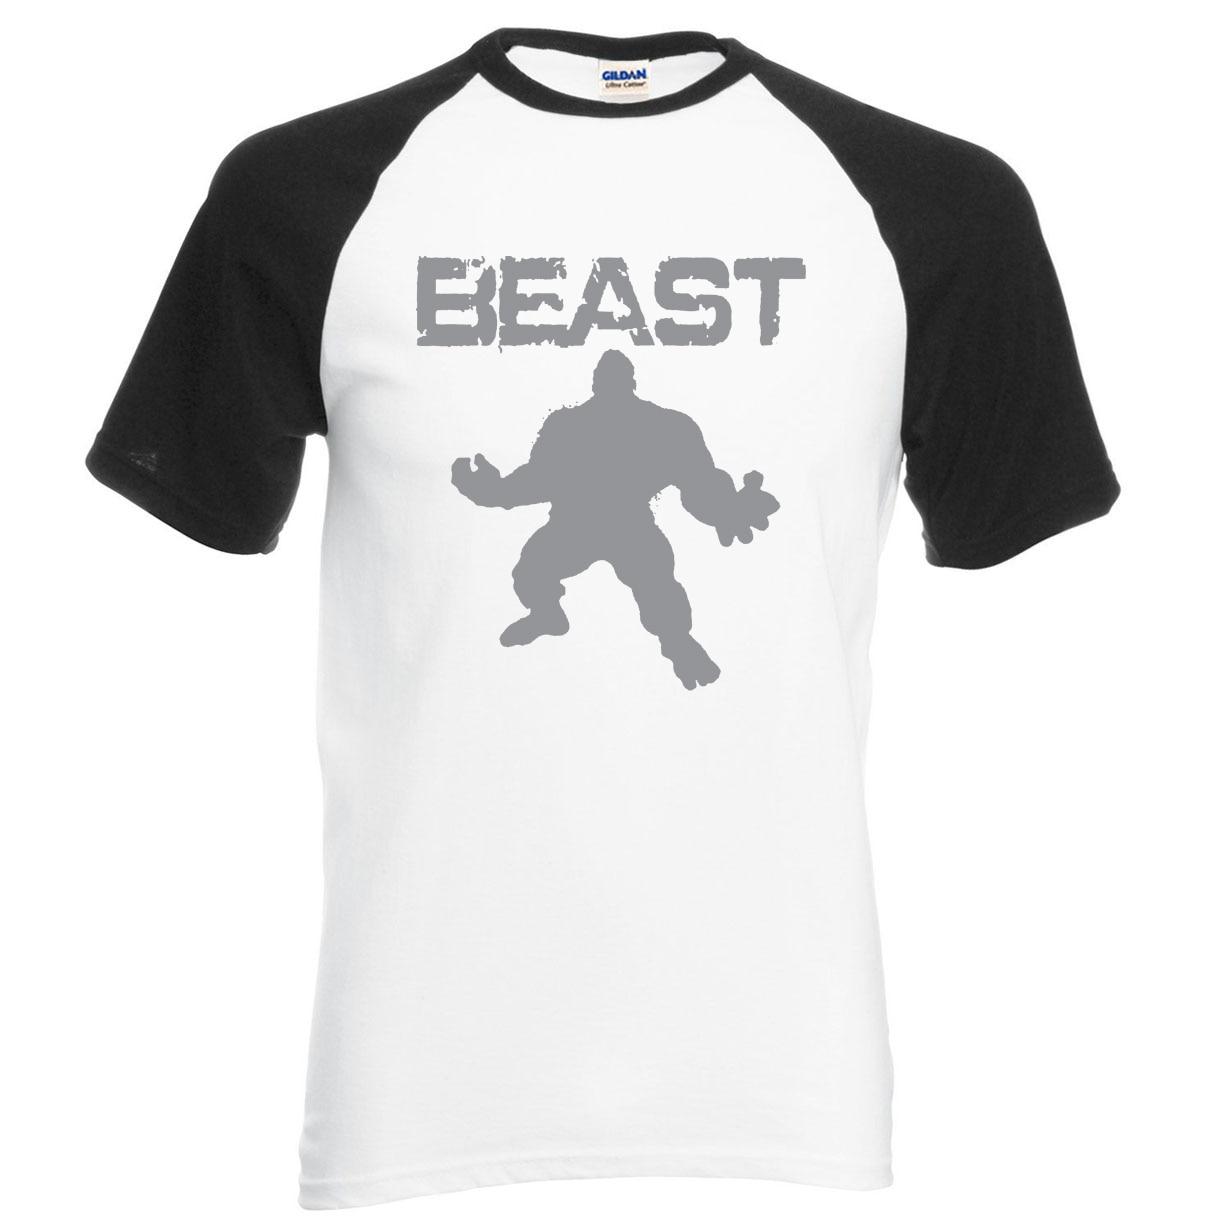 Beast Printed Crossfit Men Tee Shirts 2019 Summer Raglan Sleeve Shirt Men 100% Cotton T Shirt Gyms Muscle Fit Hip Hop Tops Tees